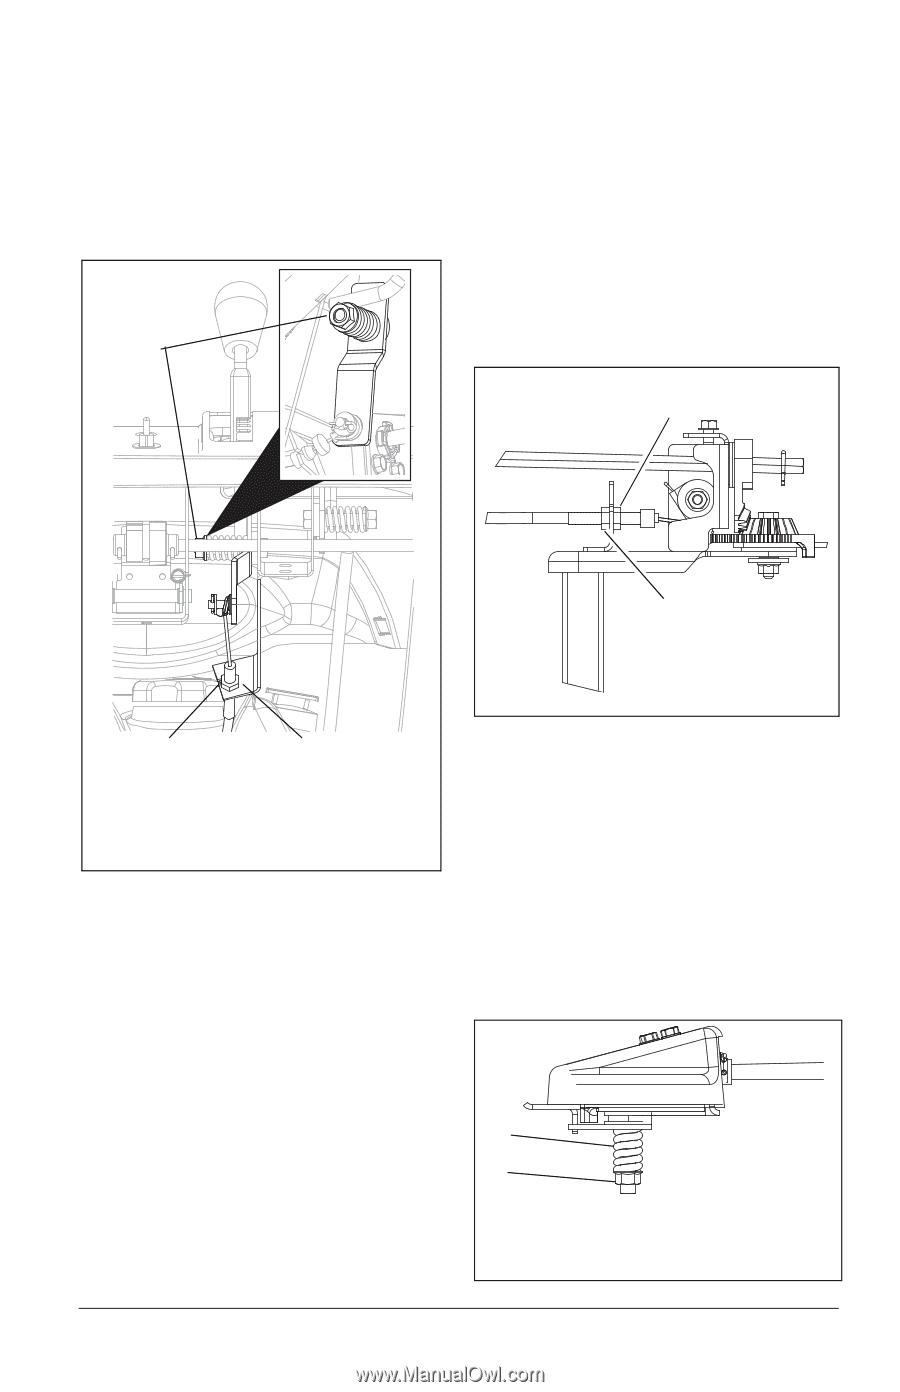 Ariens Gt 18 Wiring Diagram